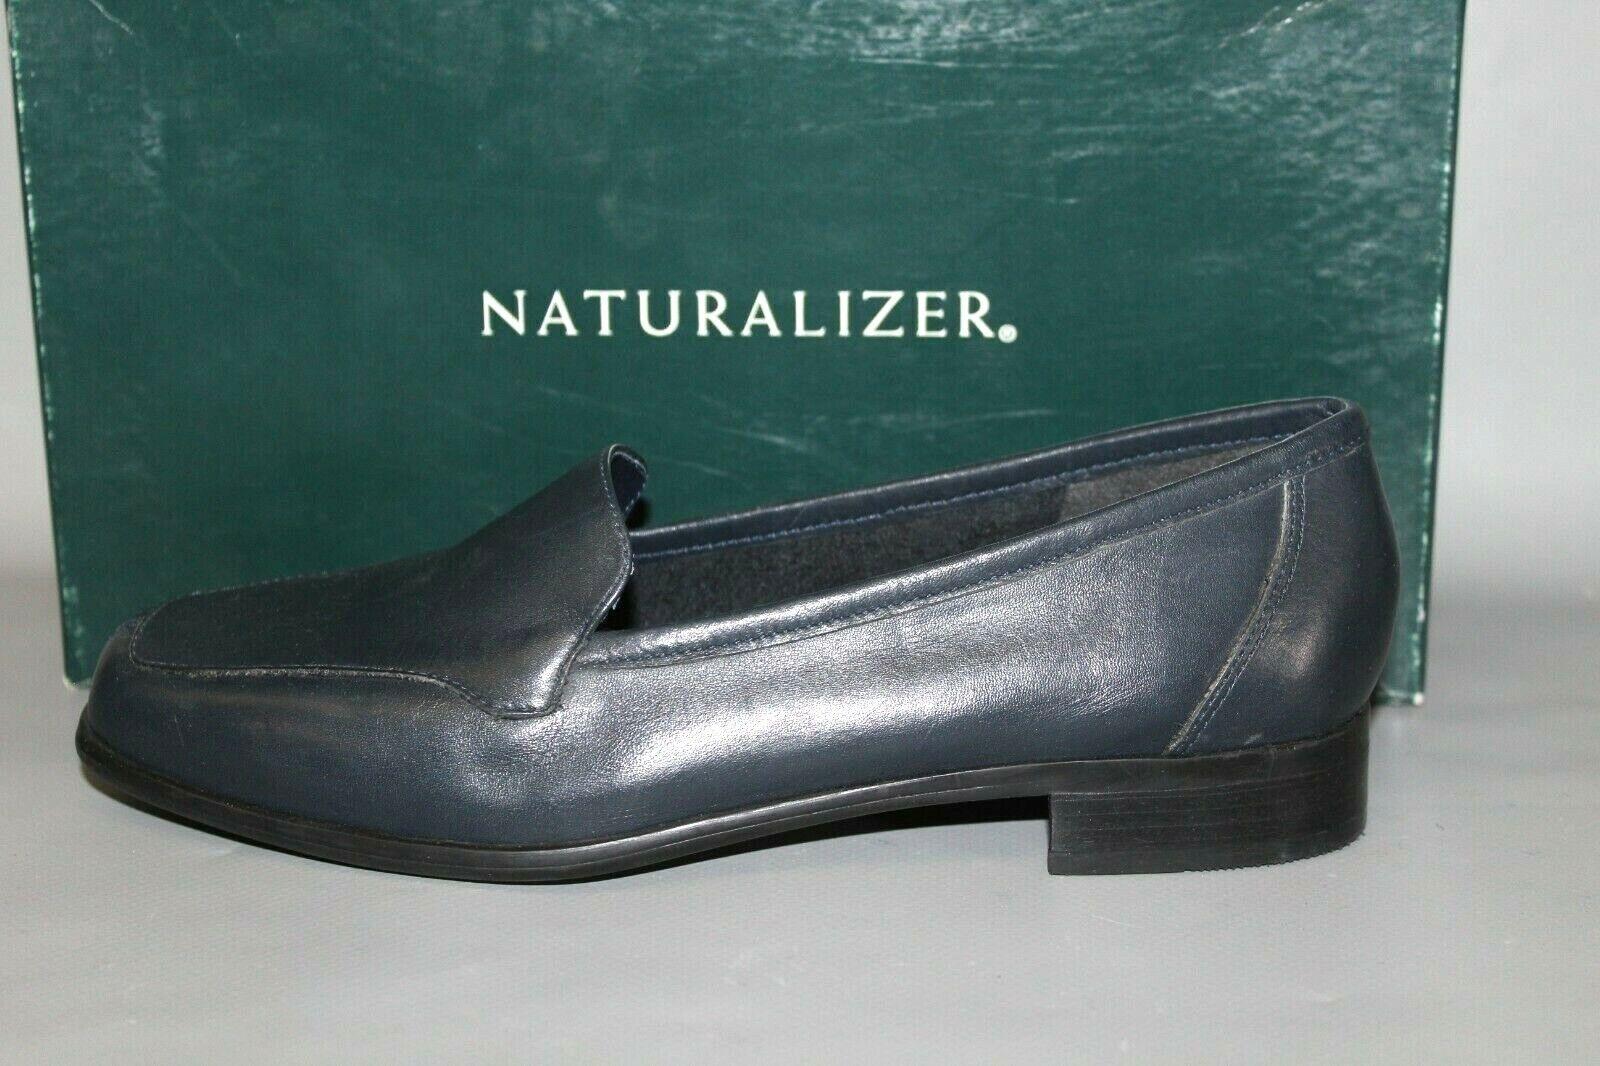 Nouveau Femme Naturalizer Stockard bleu marine en cuir Casual Slip On